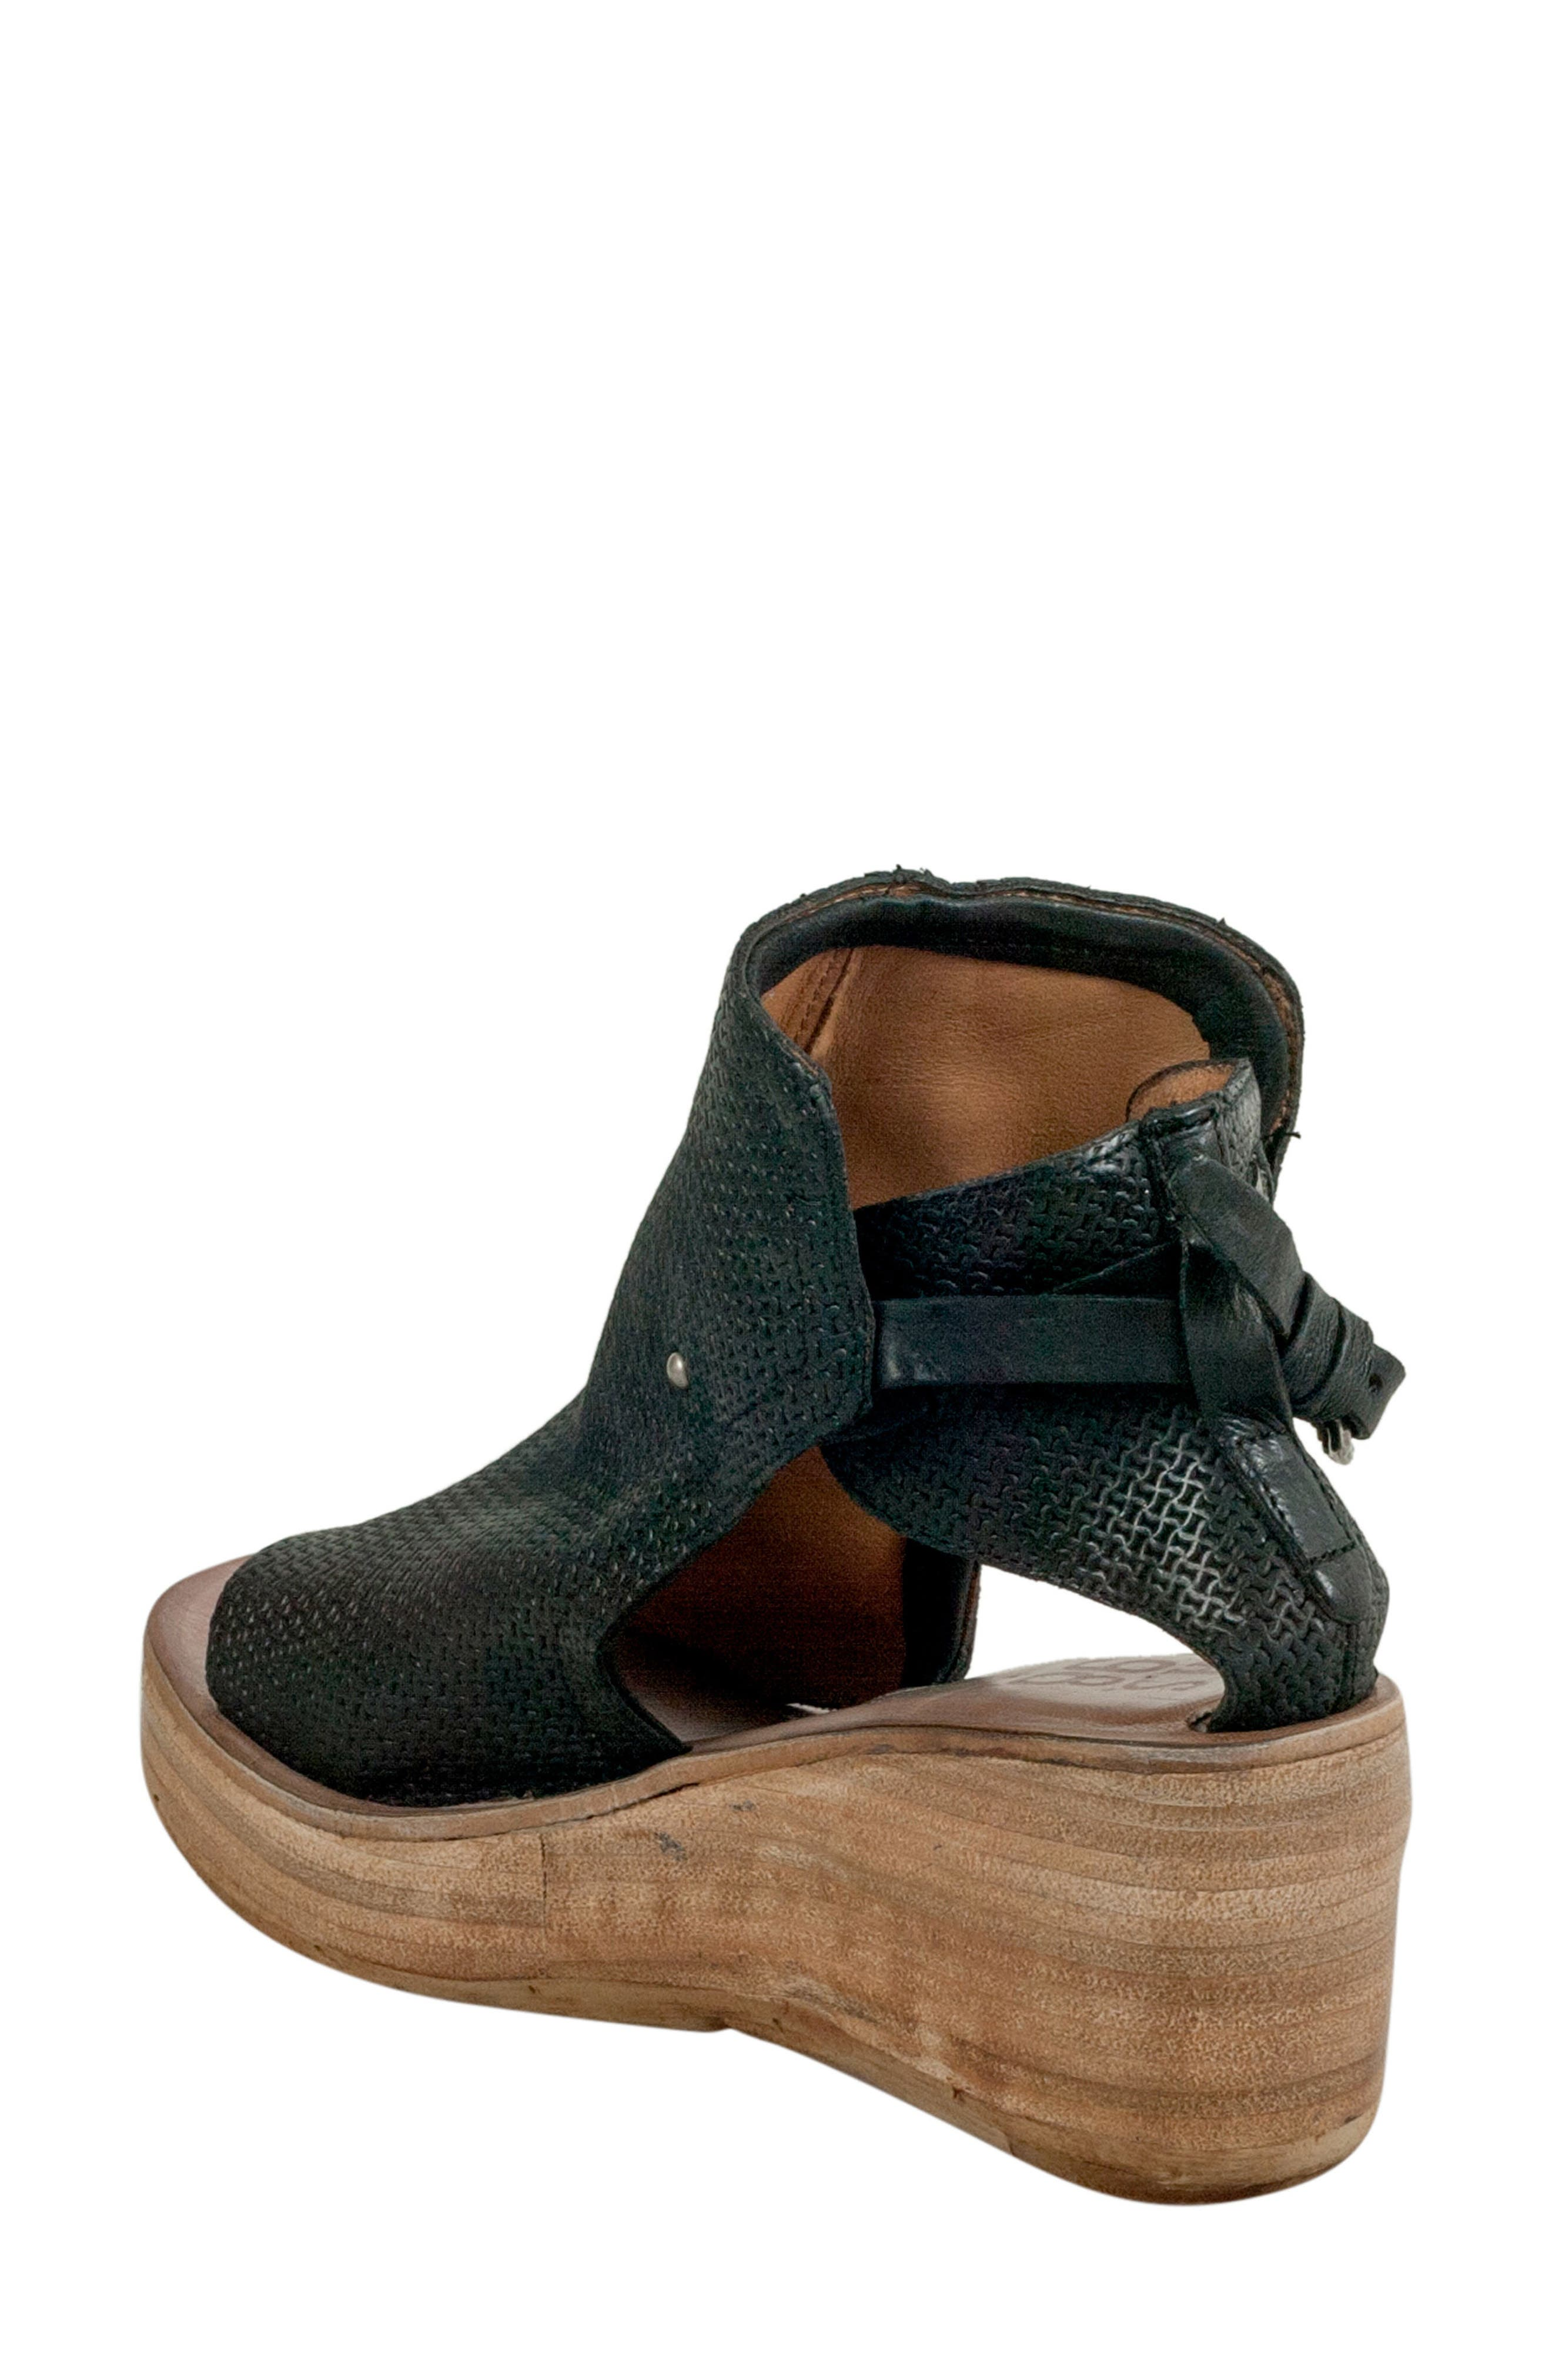 Nathan Platform Wedge Sandal,                             Alternate thumbnail 2, color,                             Black